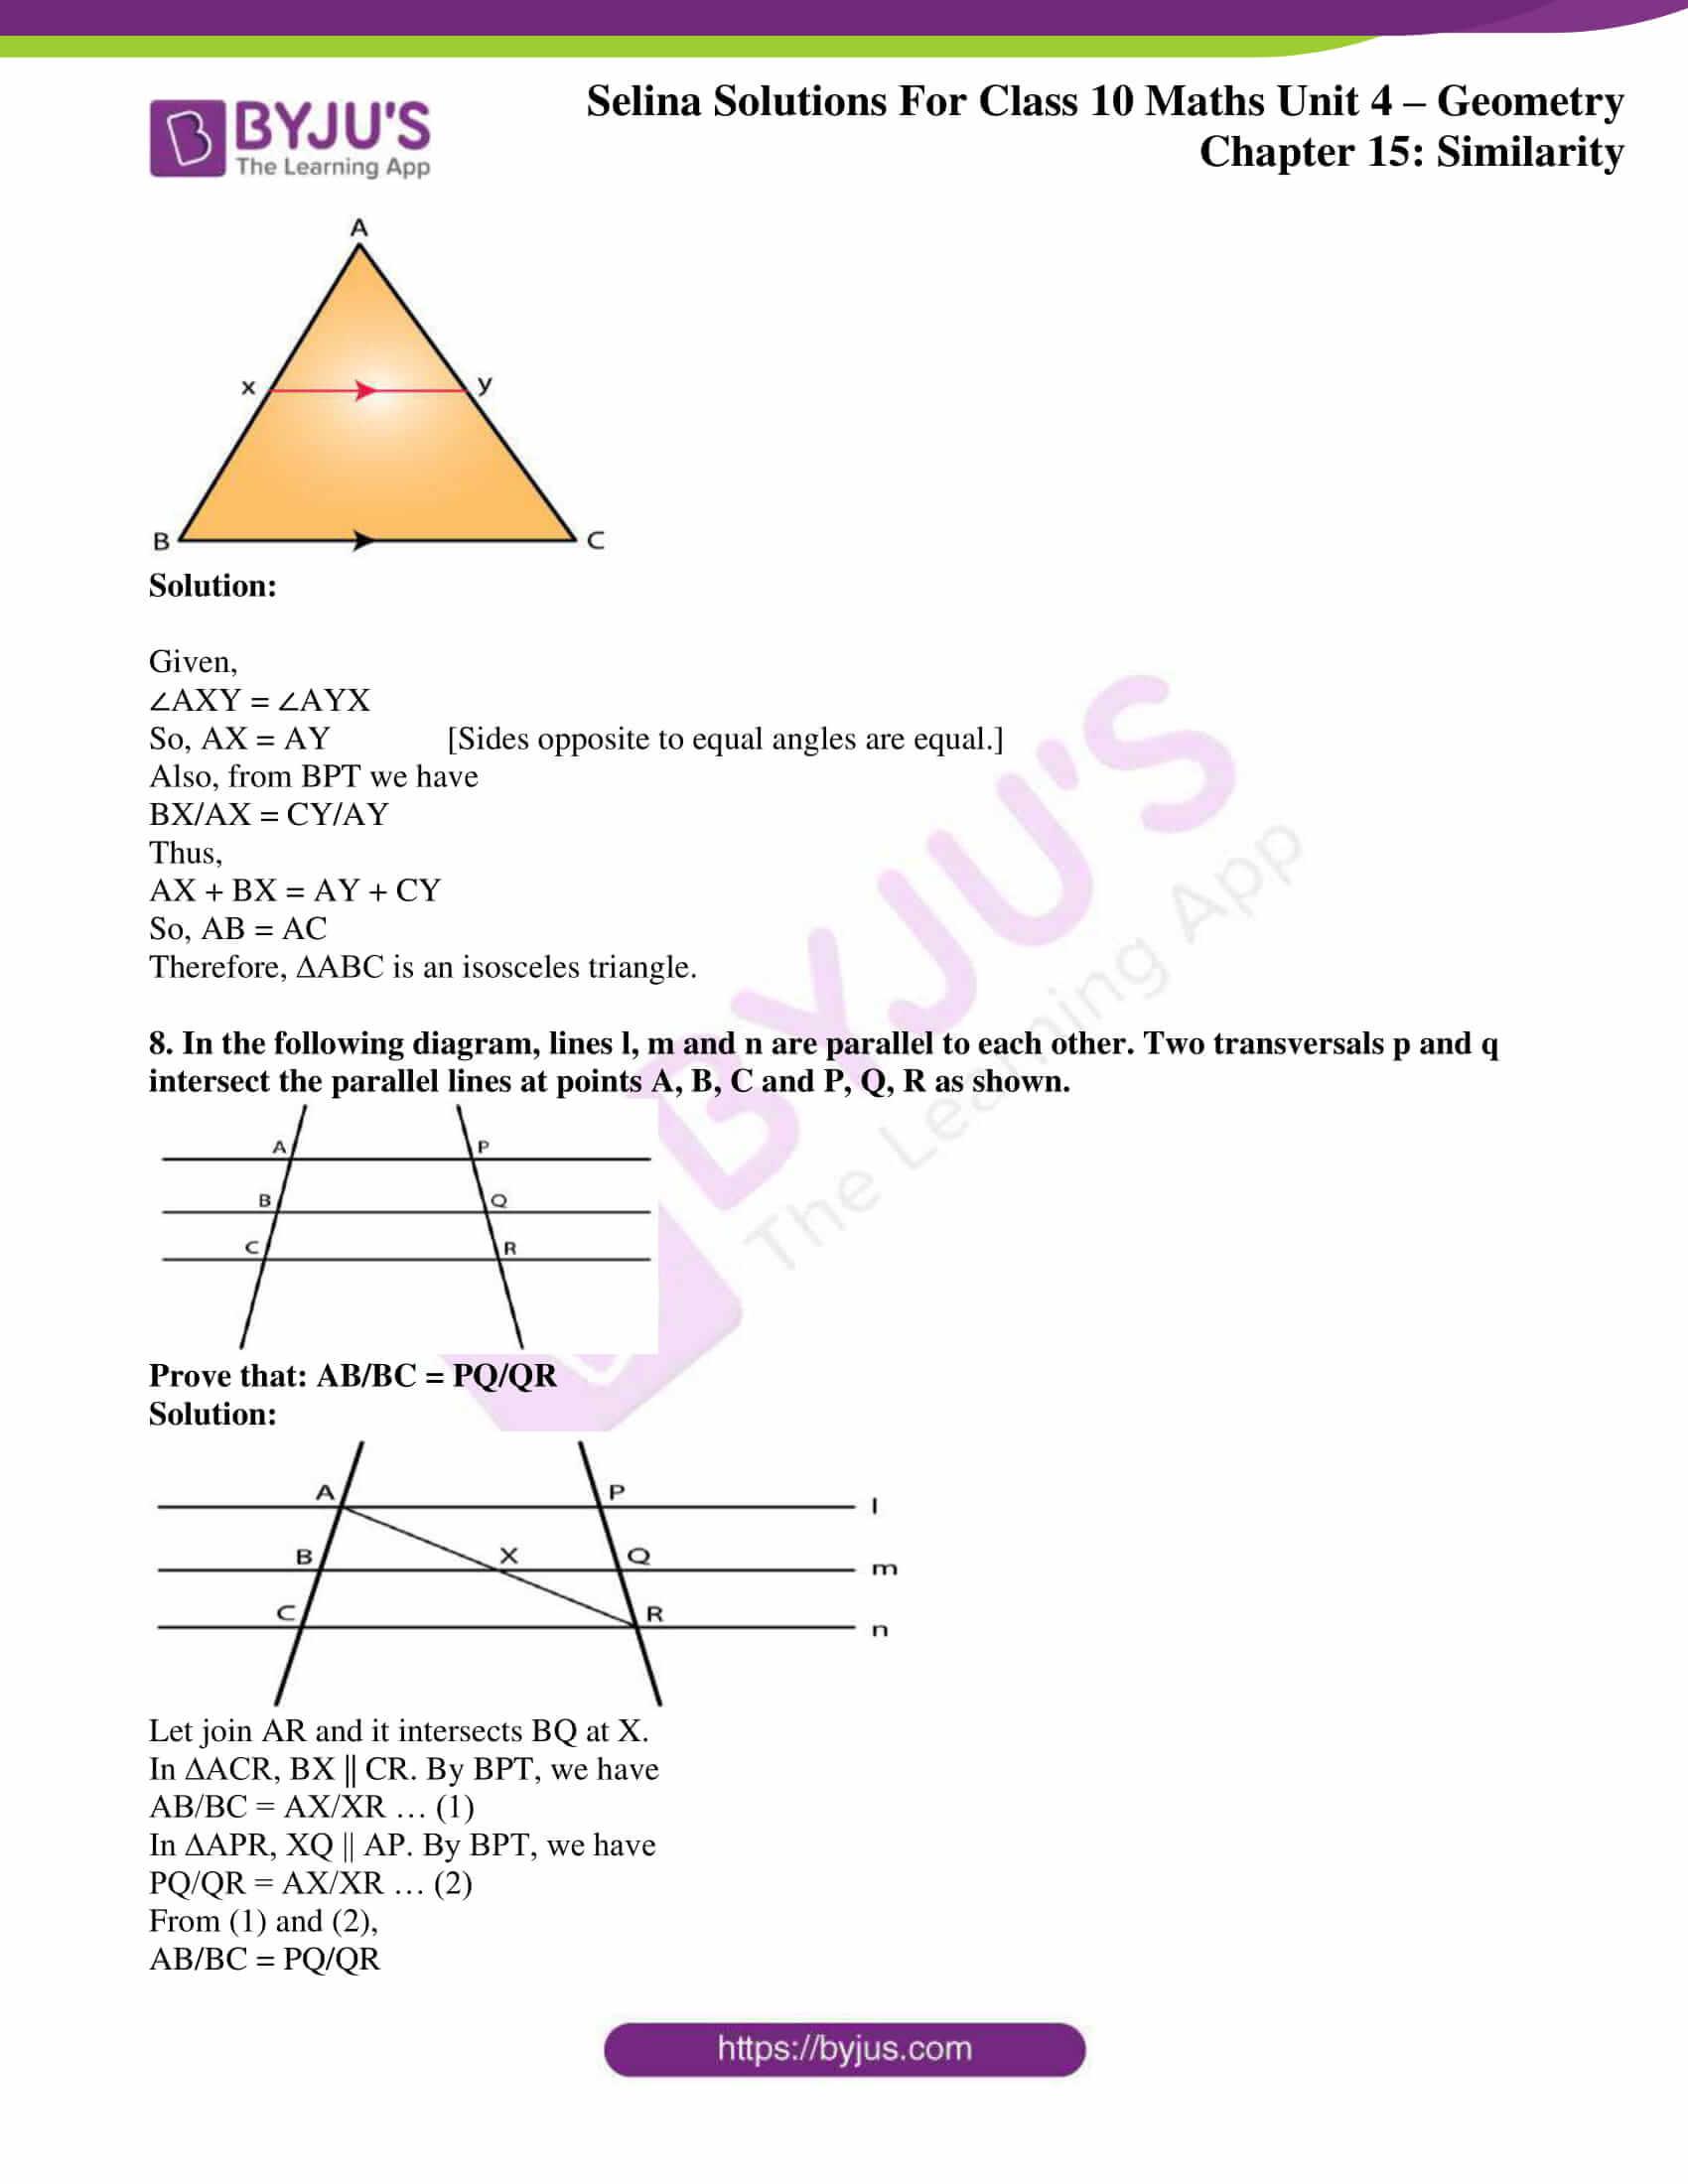 selina-sol-maths-class-10-ch-15-ex-e-5